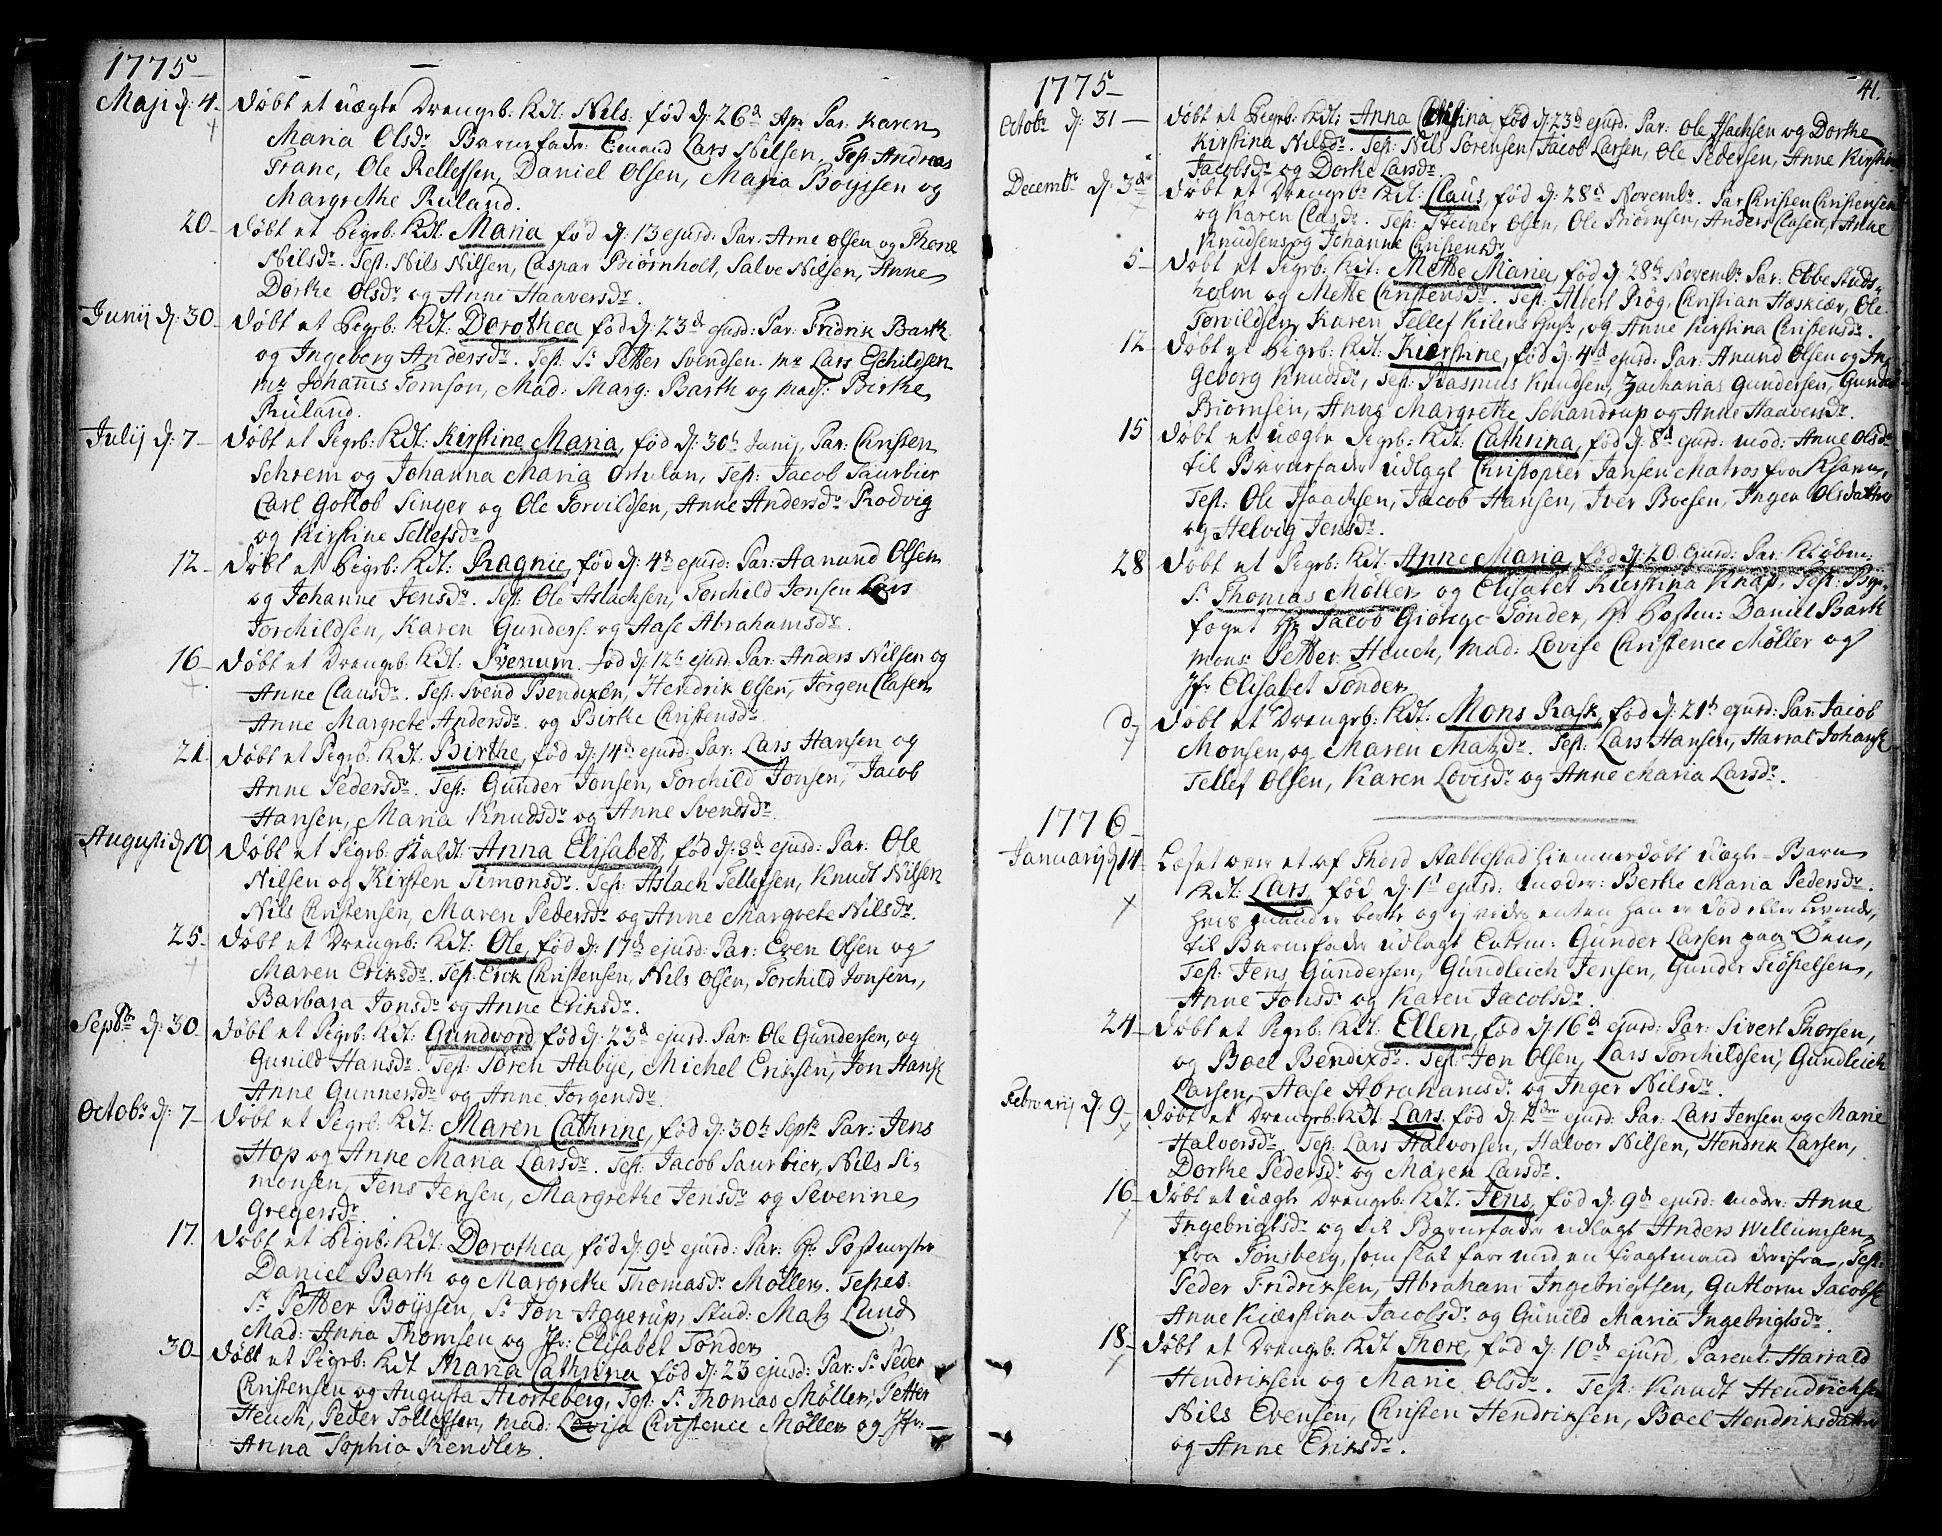 SAKO, Kragerø kirkebøker, F/Fa/L0002: Ministerialbok nr. 2, 1767-1802, s. 41